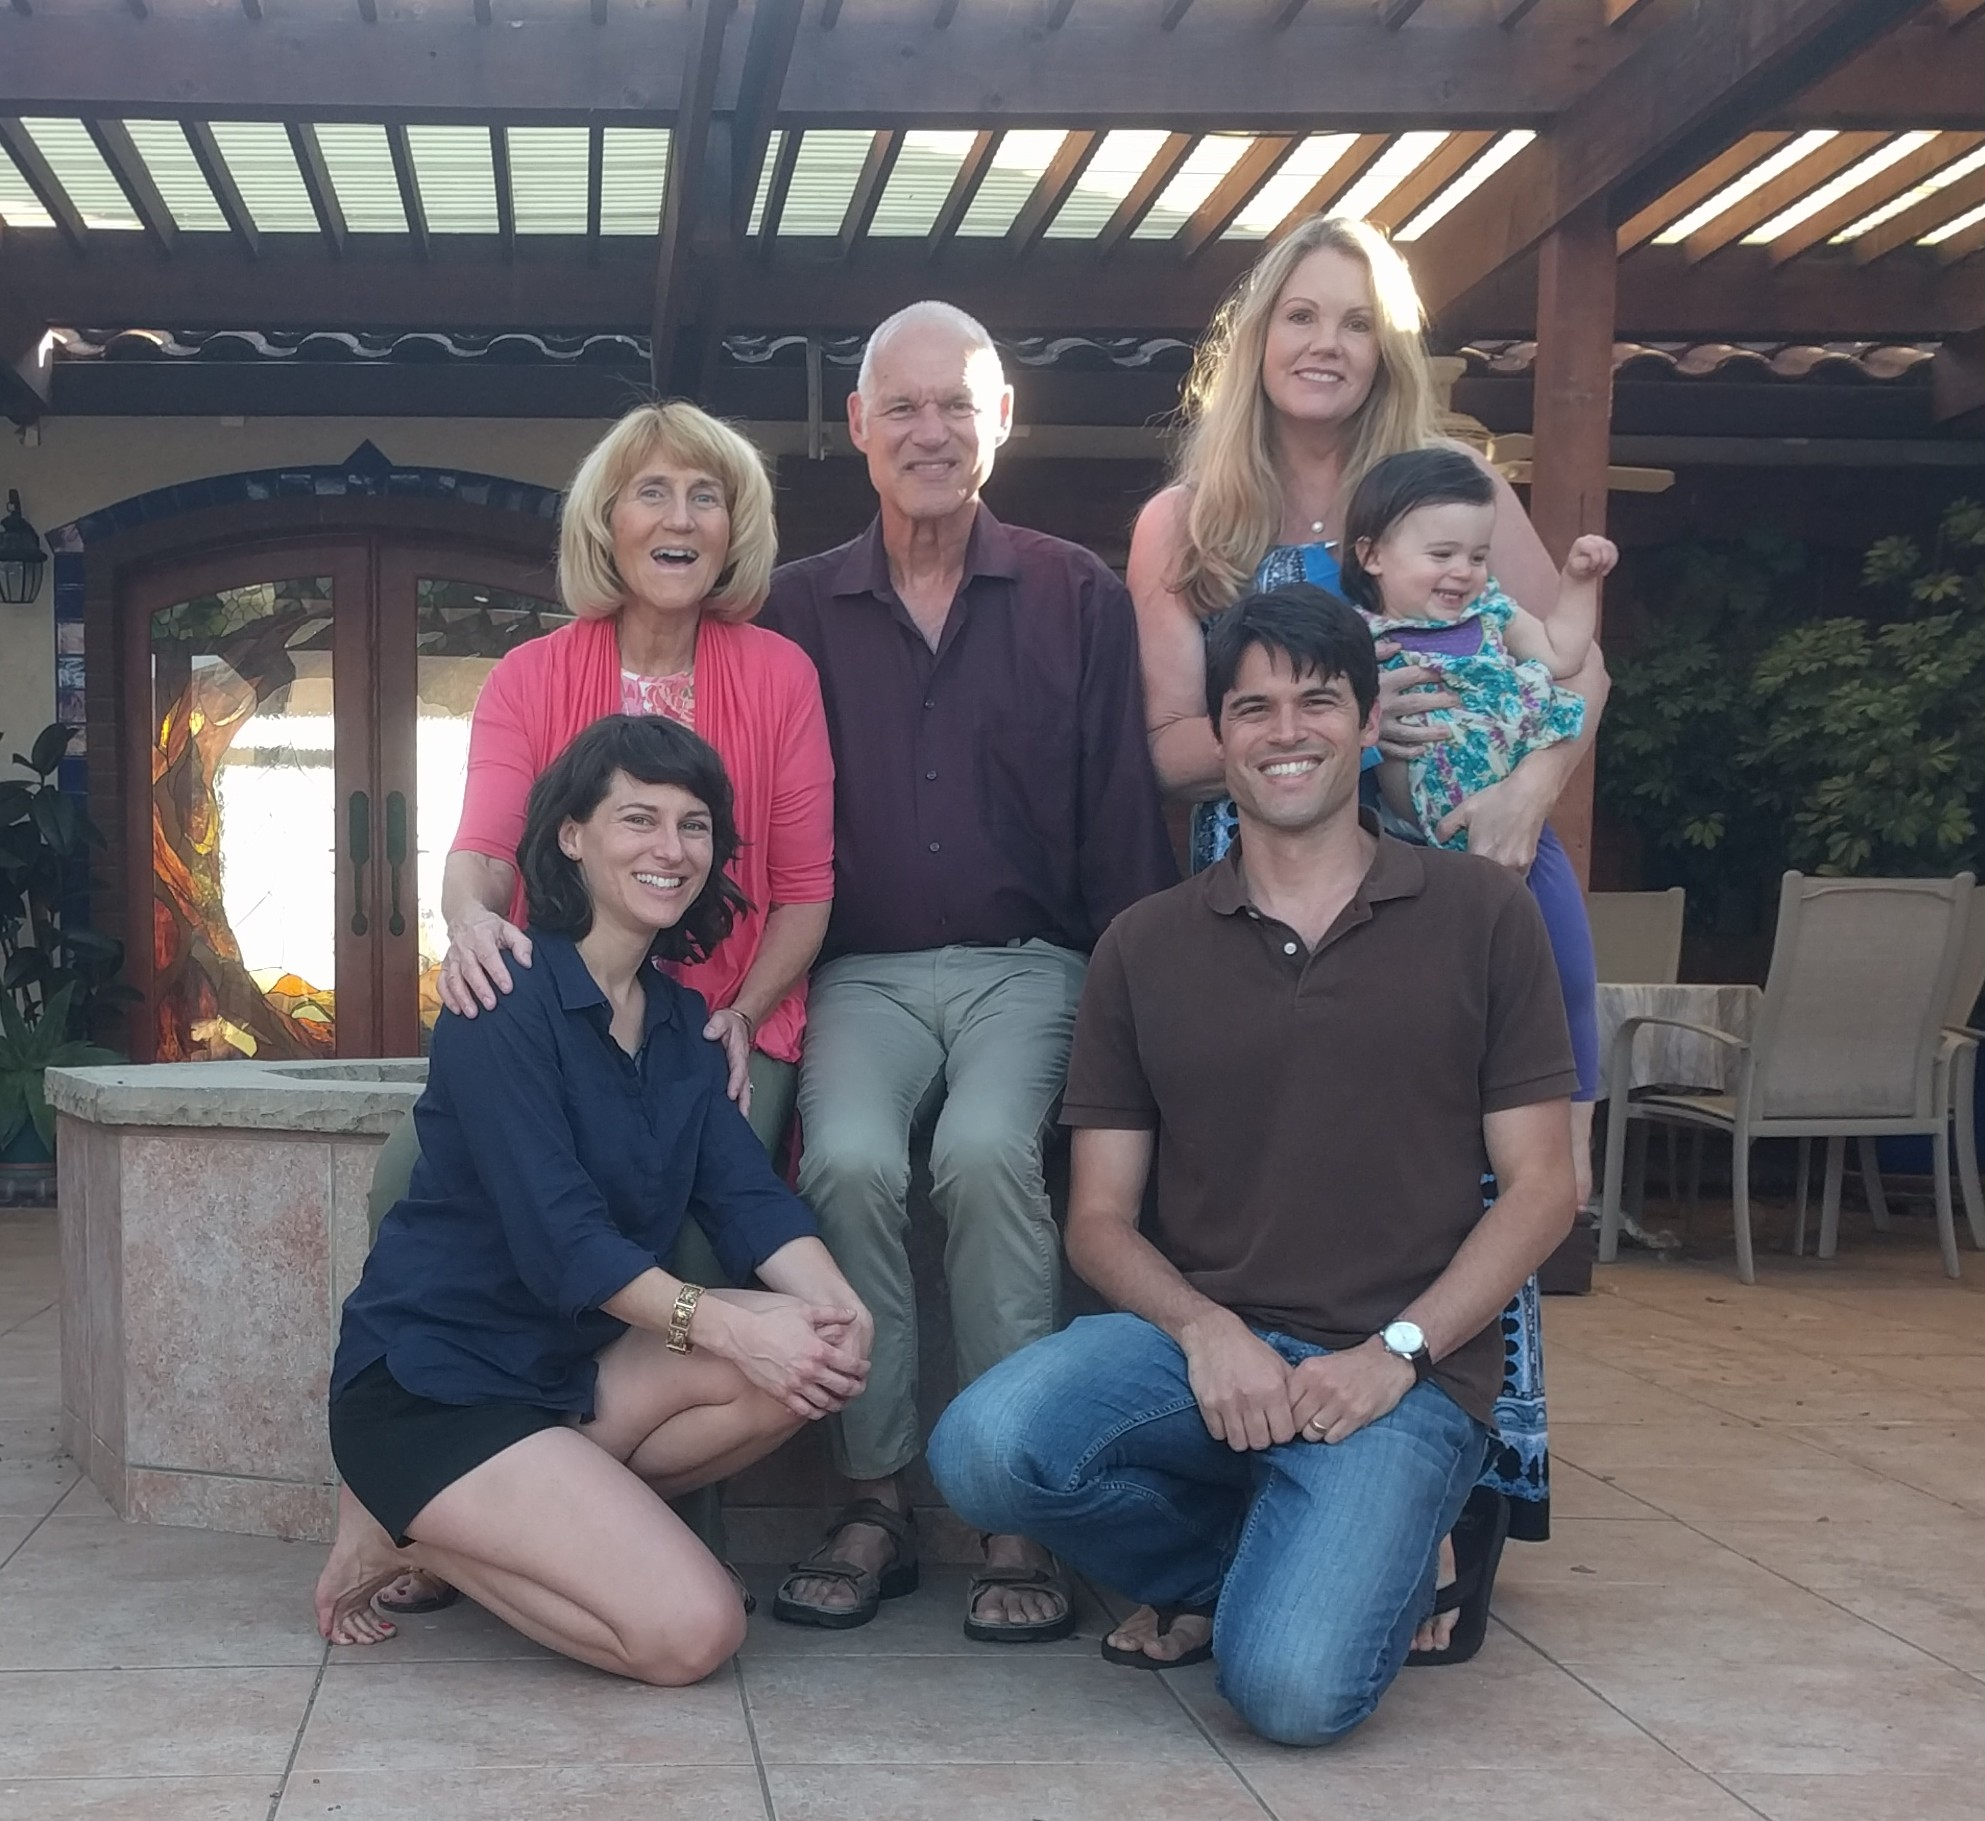 family_cloud_house_patio